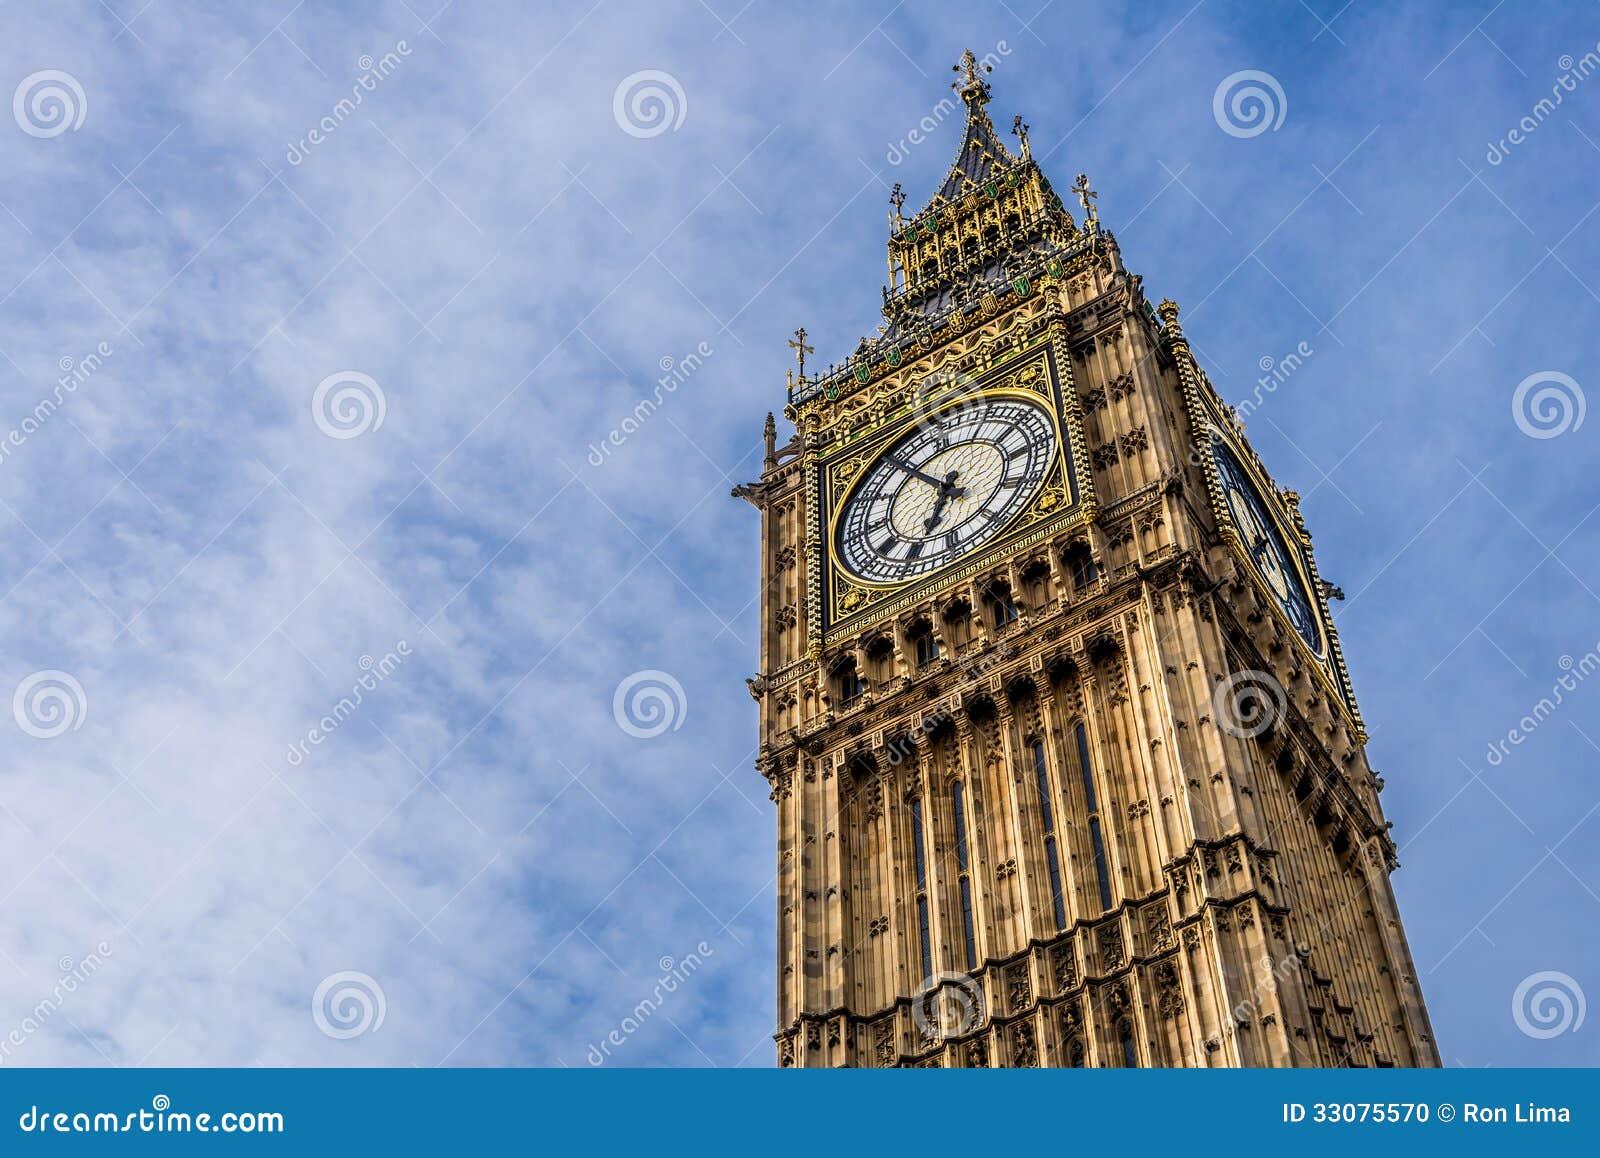 Daytime date ideas london